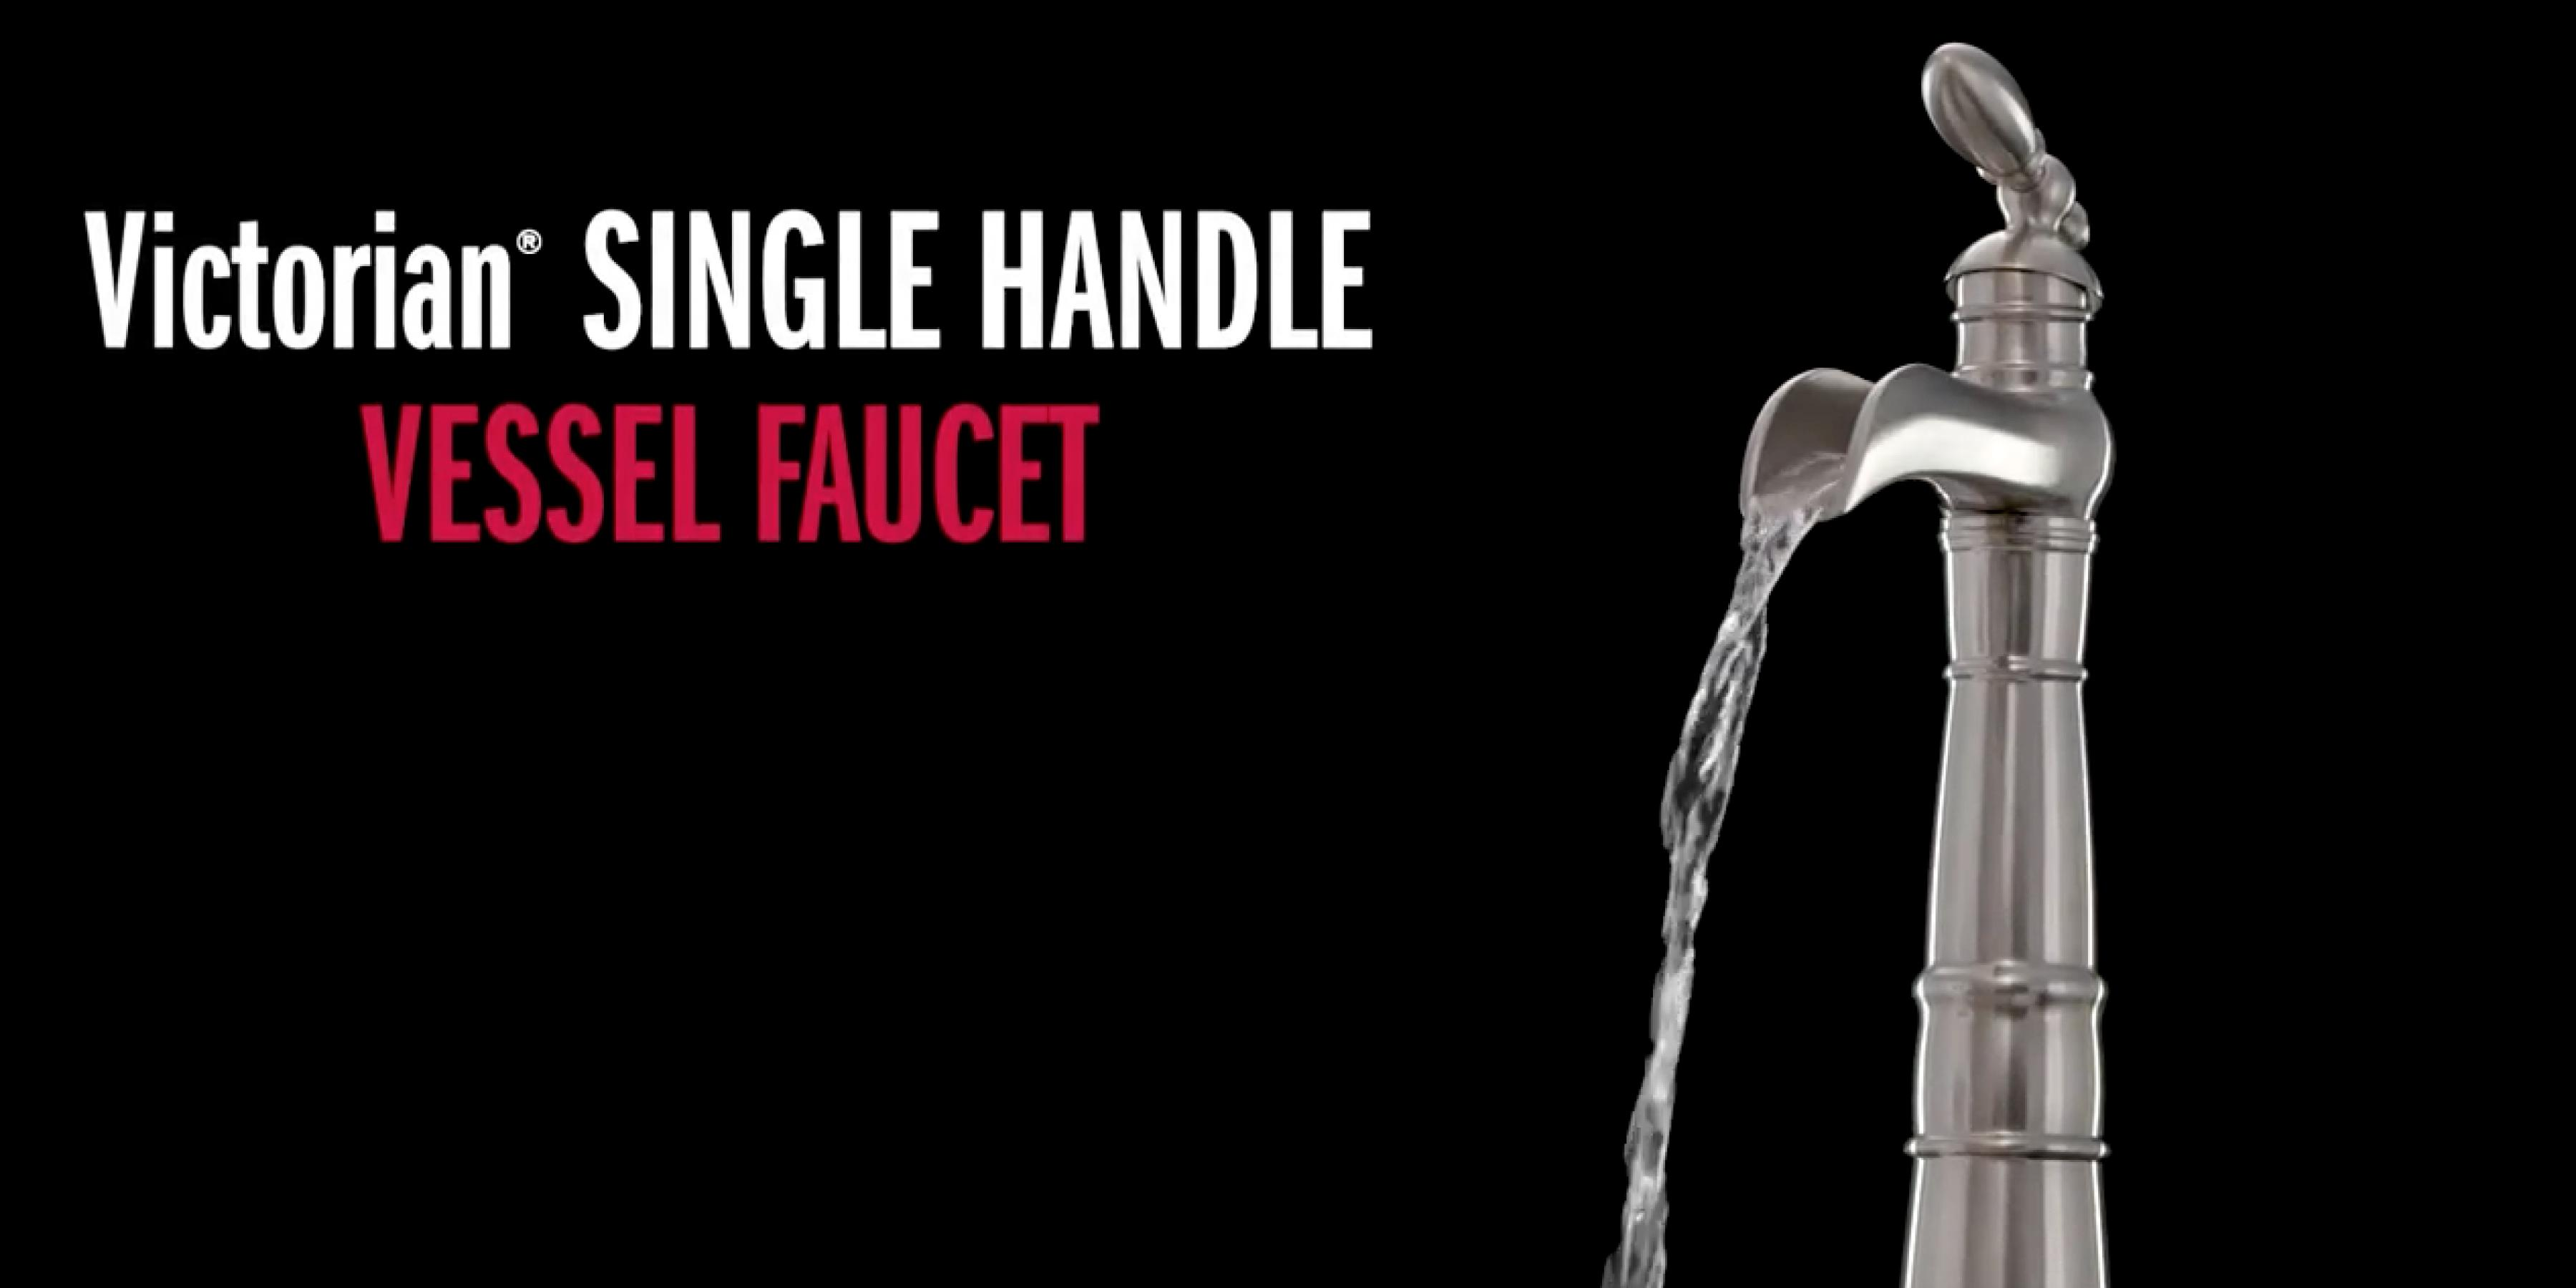 Victorian® Single Handle Vessel Faucet